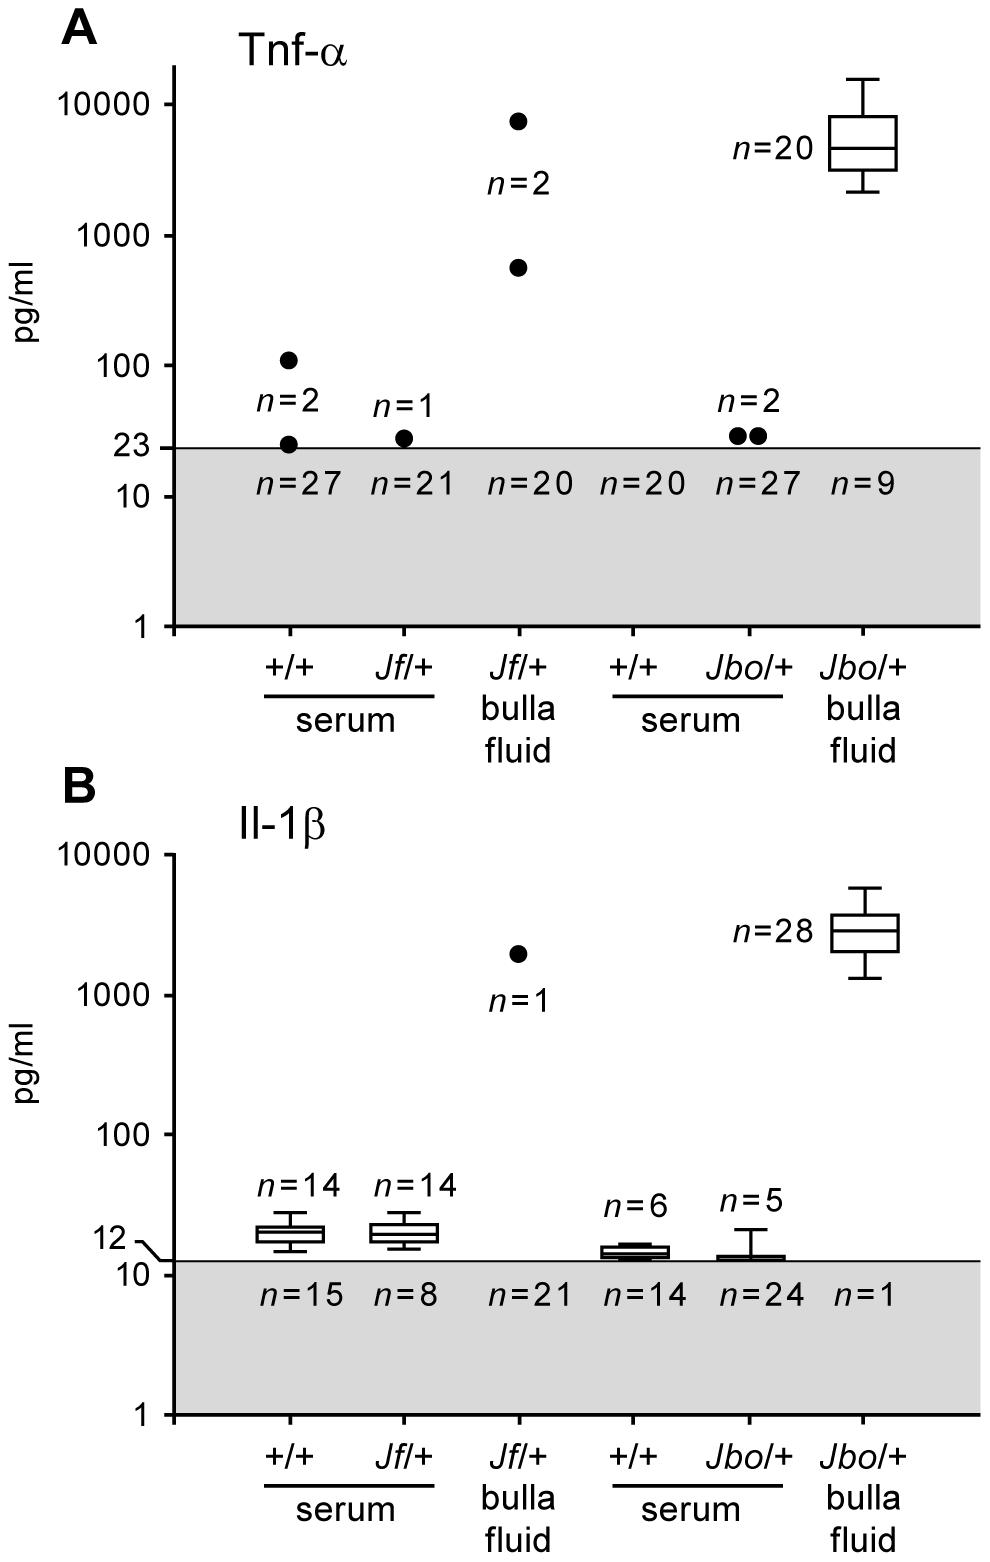 Il-1β and Tnf-α titers in bulla fluids are elevated in <i>Jbo/+</i> but not <i>Jf/+</i> mice.